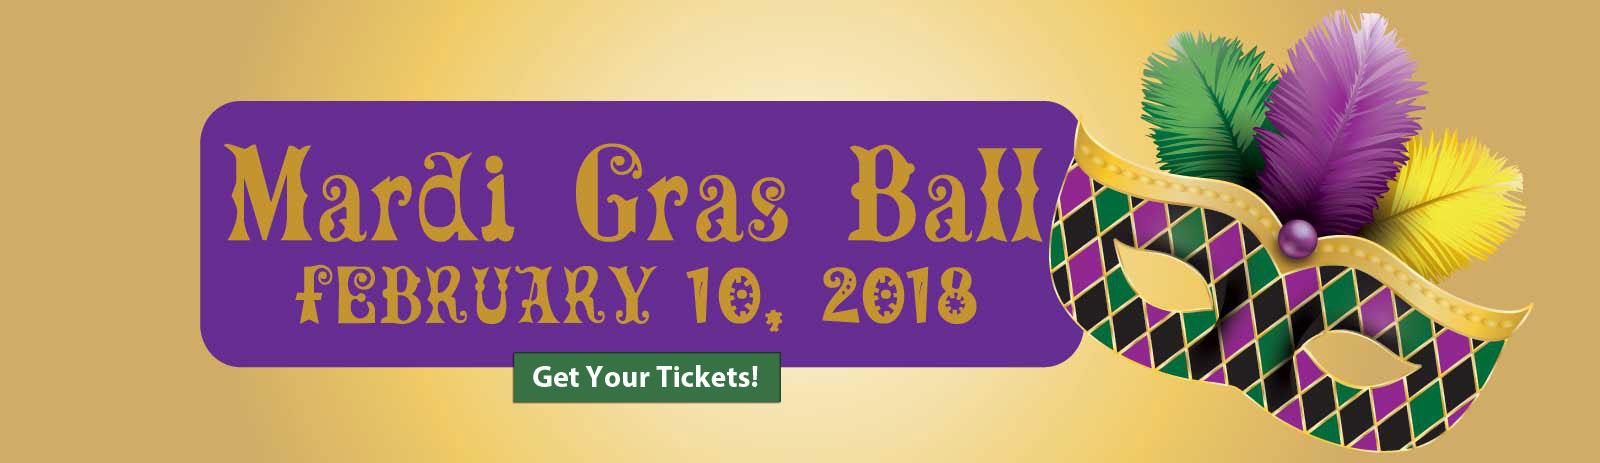 St. Katharine Drexel - Mardi Gras Ball